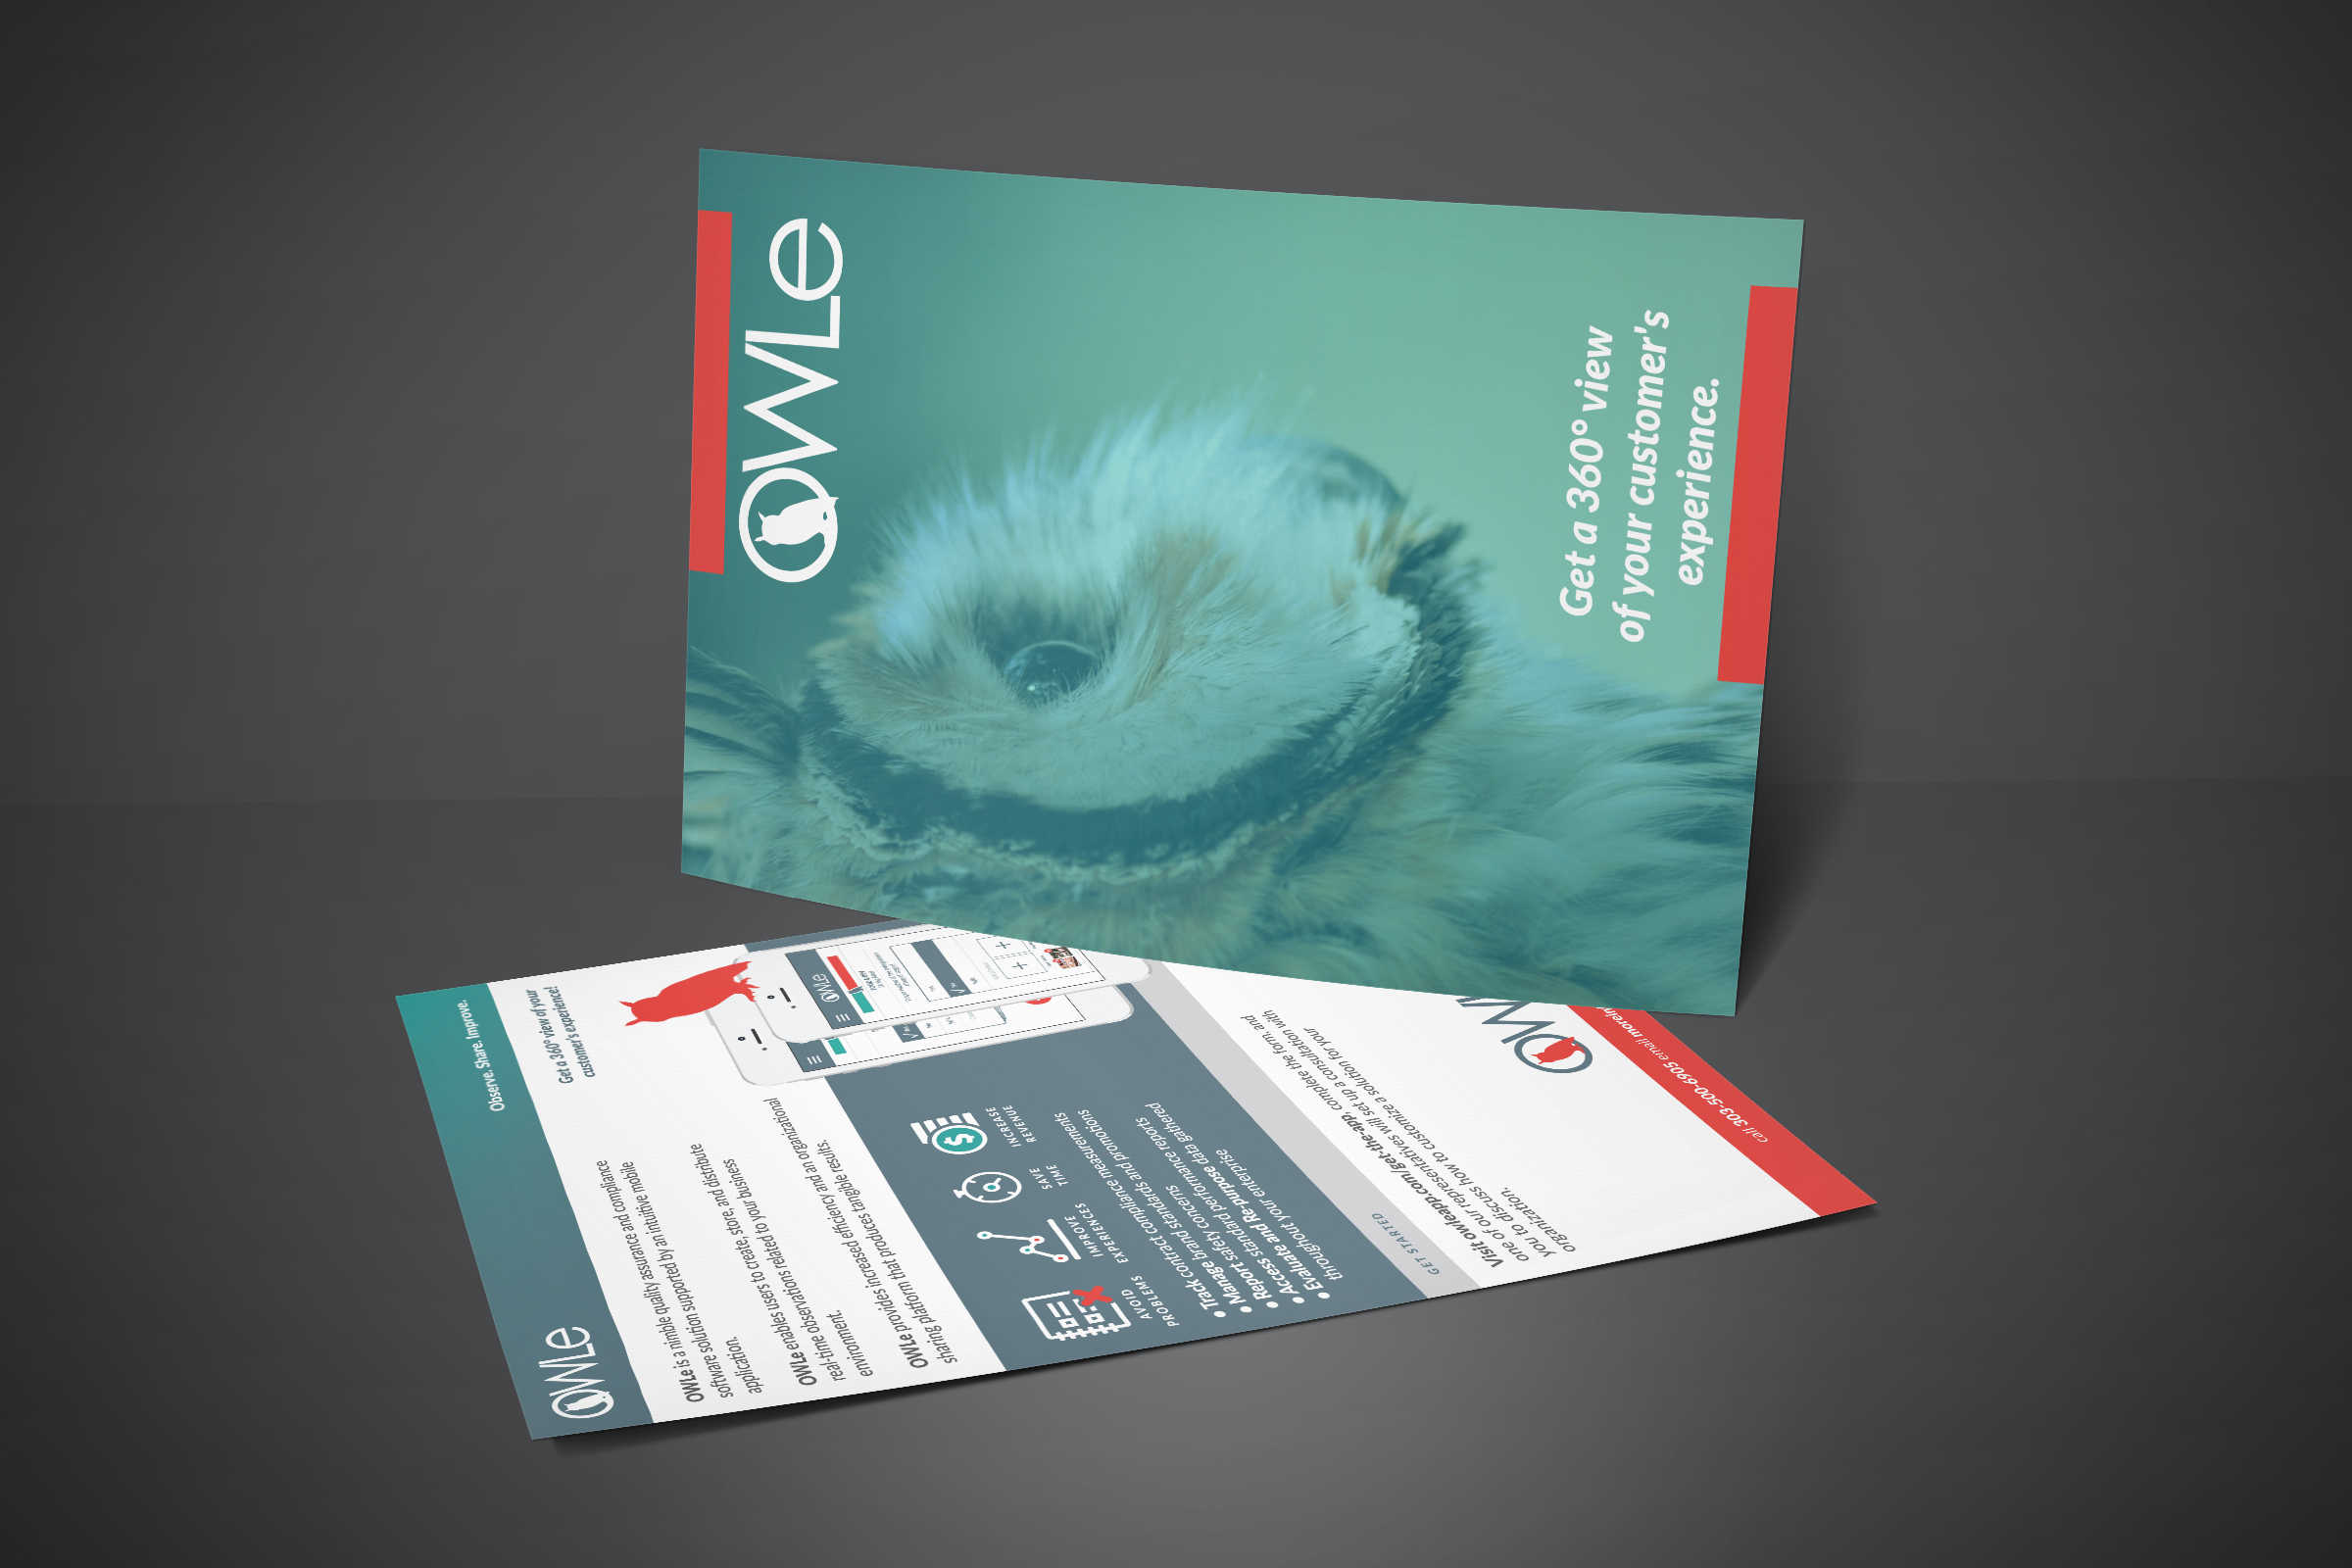 hearthfire-creative-marketing-collateral-brand-identity-designer-denver-colorado-owle-8.jpg